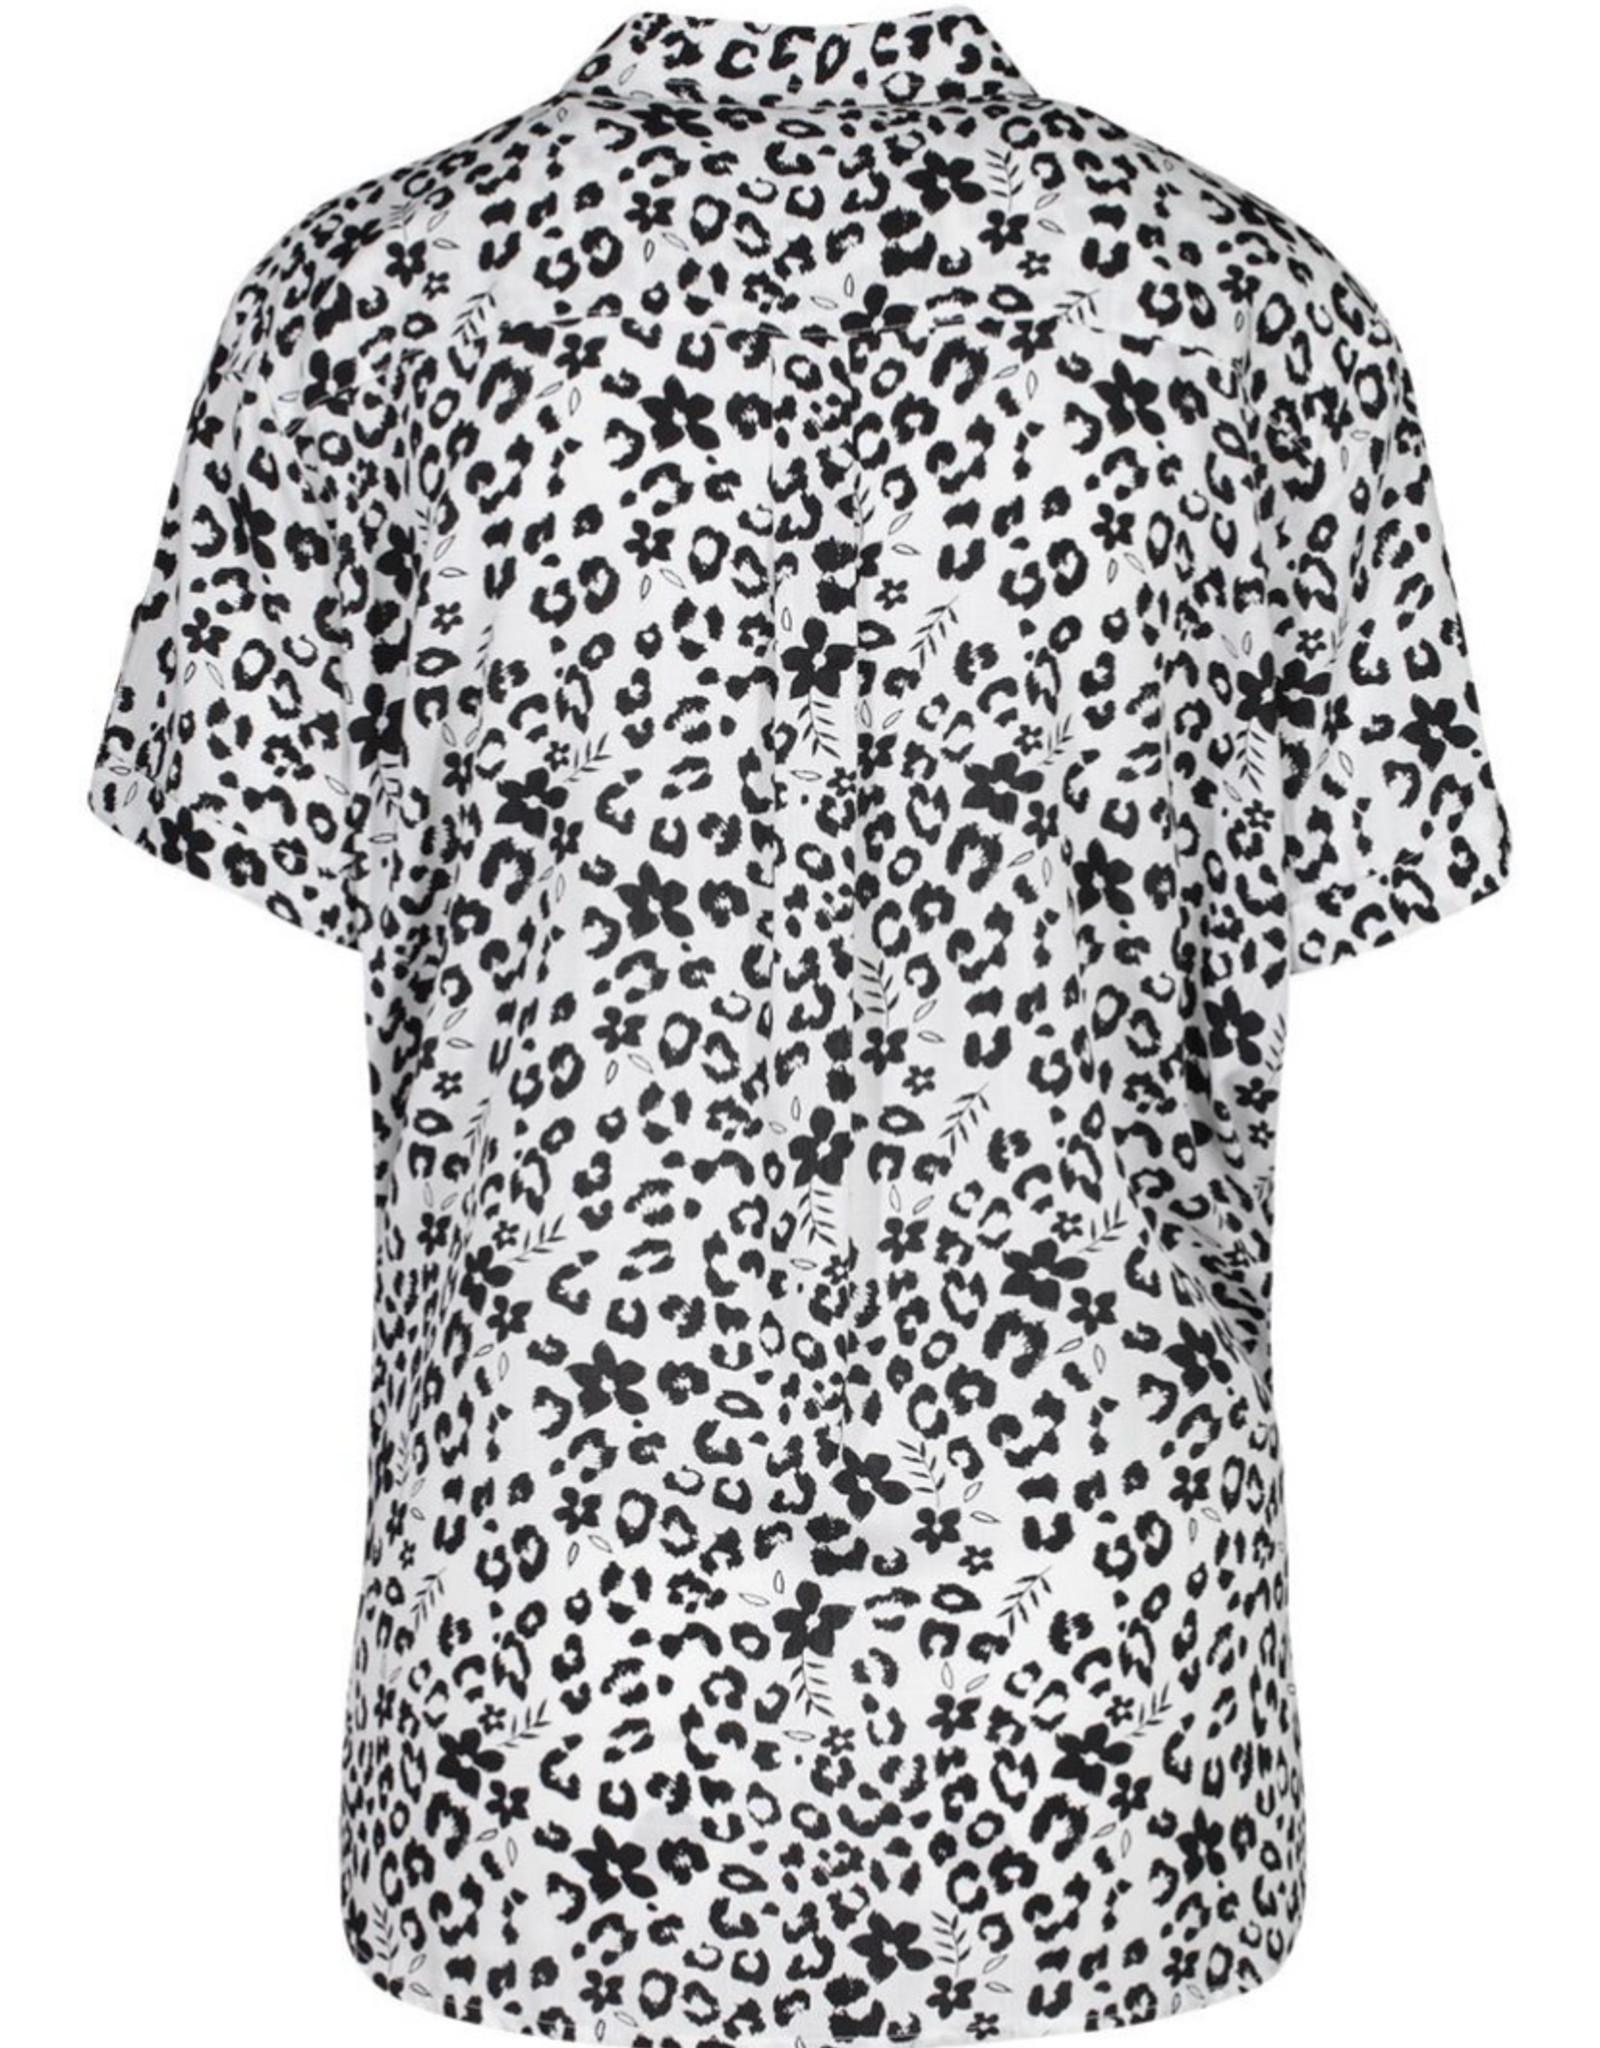 Roll-up s/s shirt